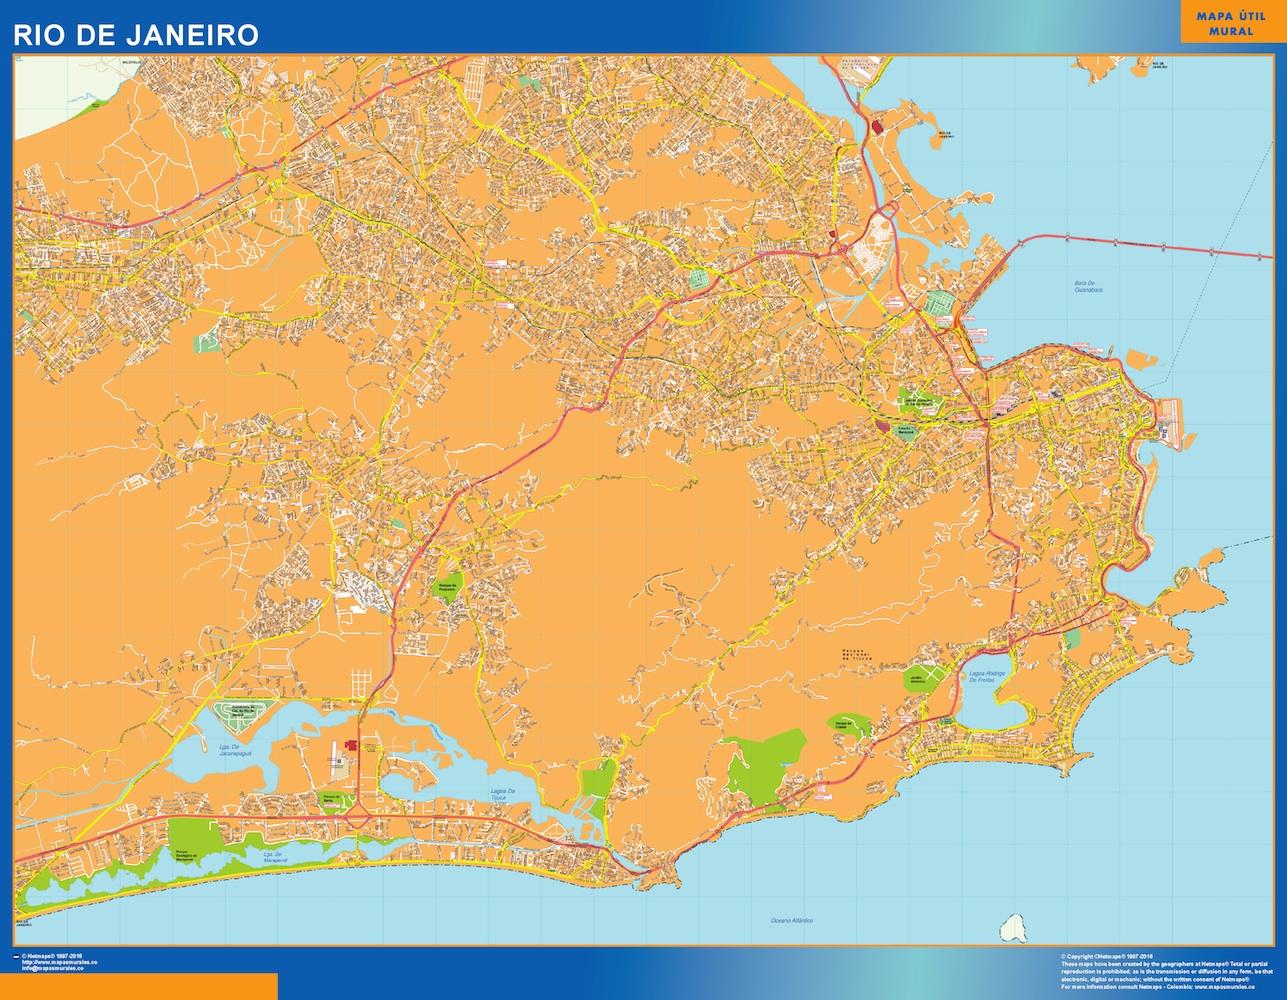 Mapa Rio de Janeiro Brasil plastificado gigante